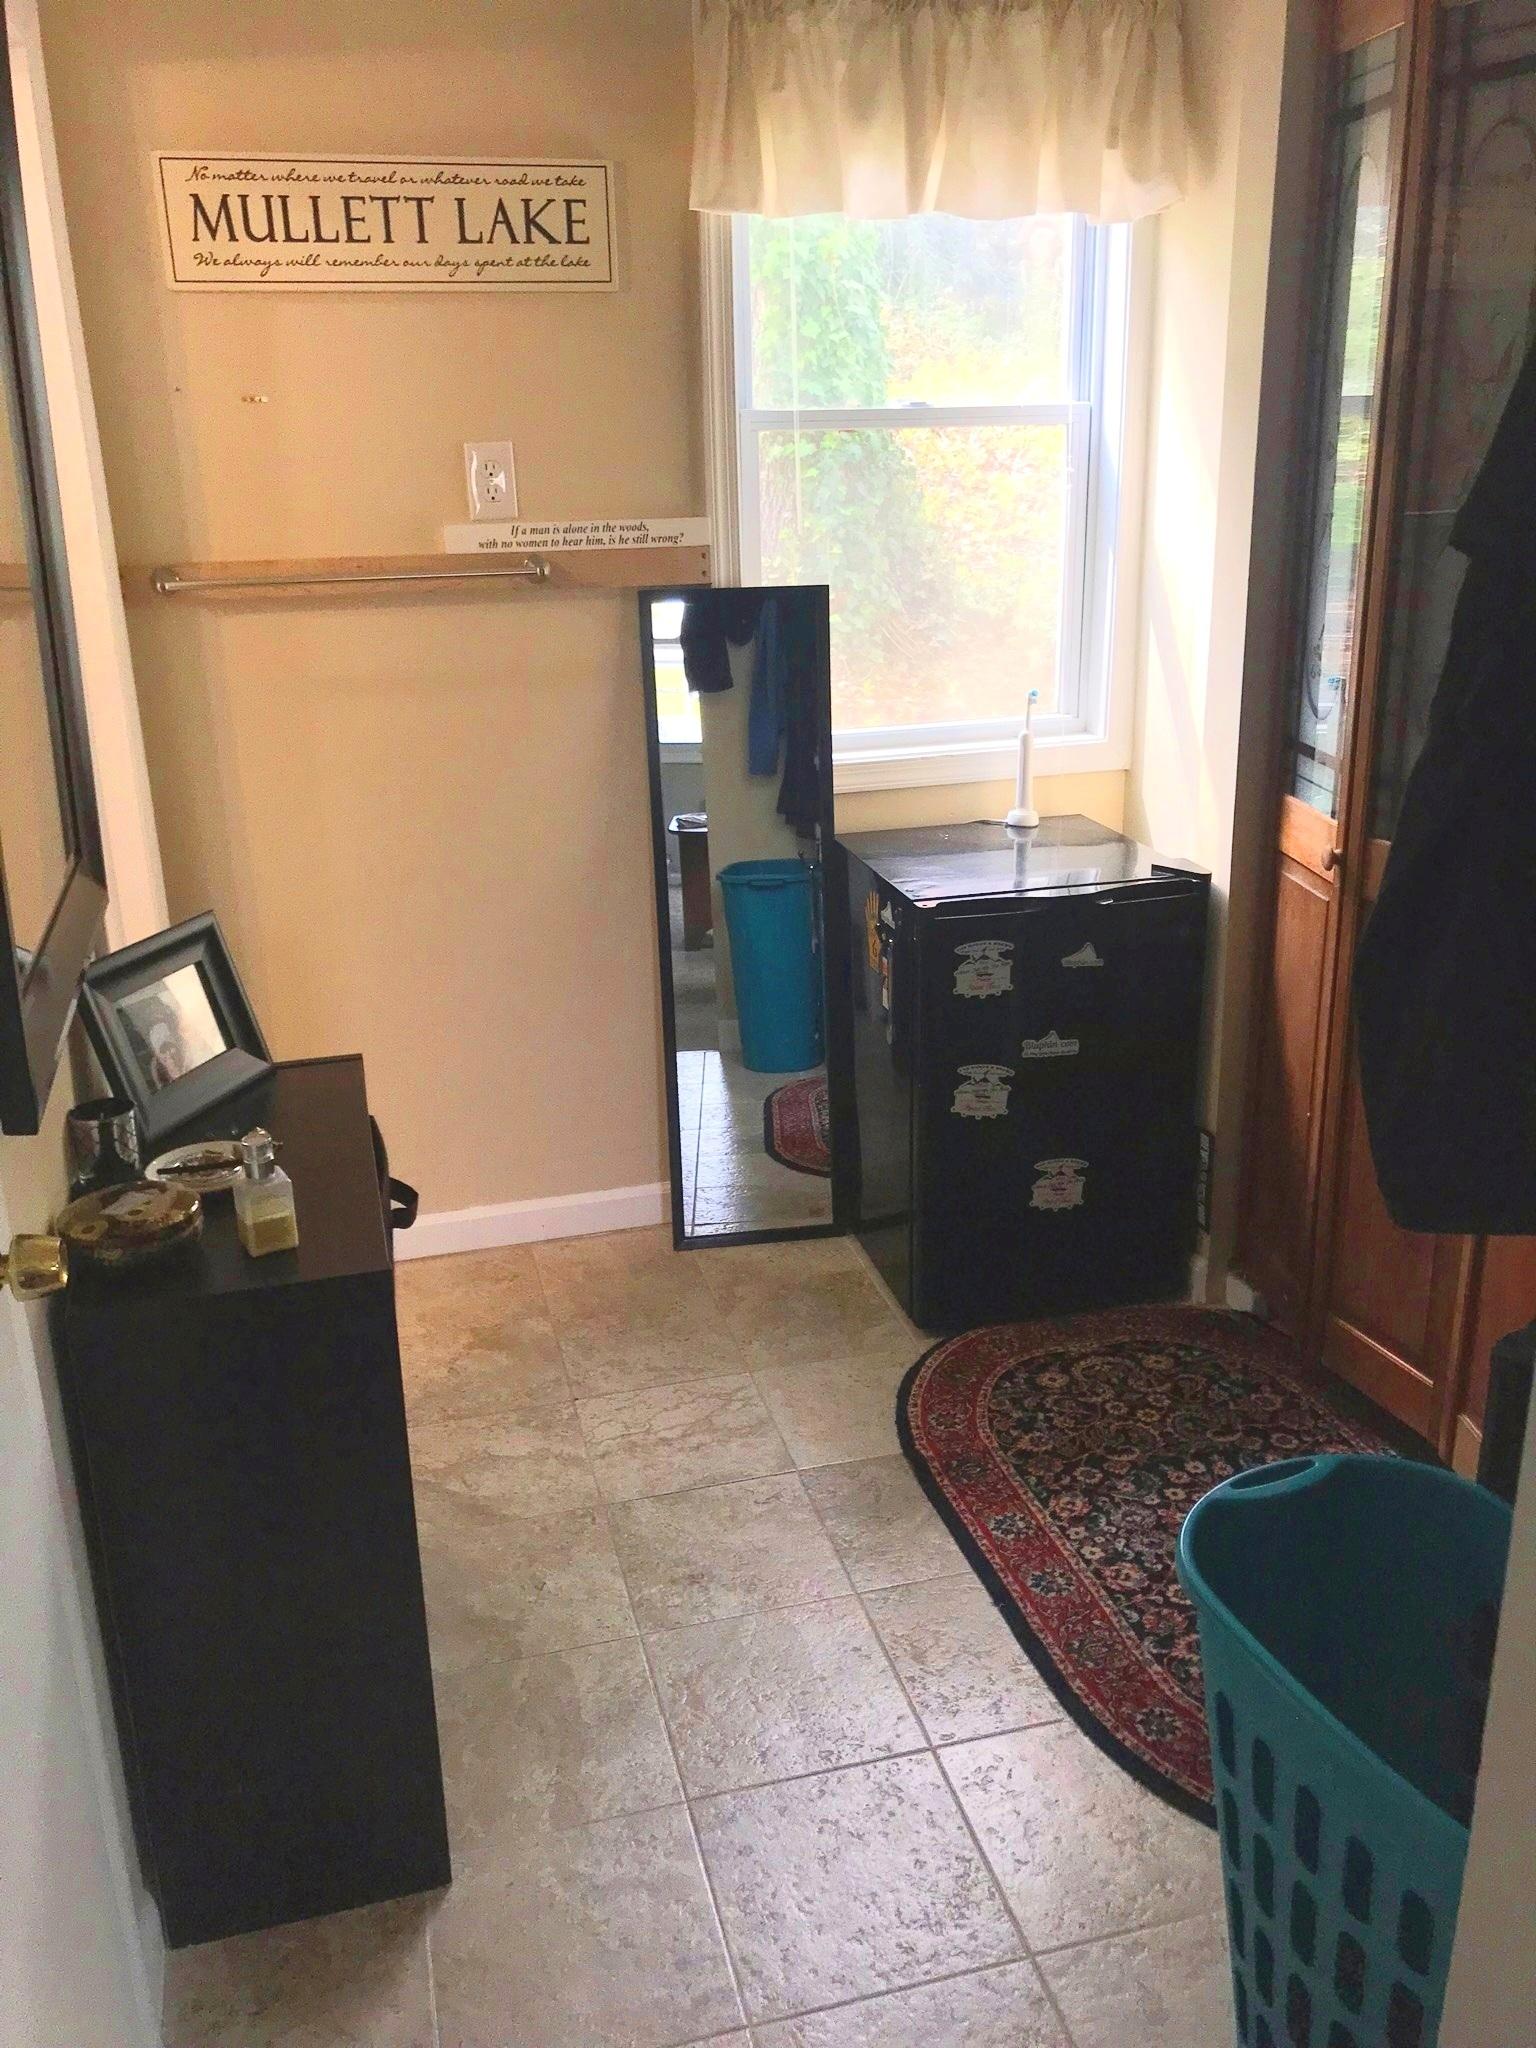 Closet room - Bathroom left, full closet to the right.